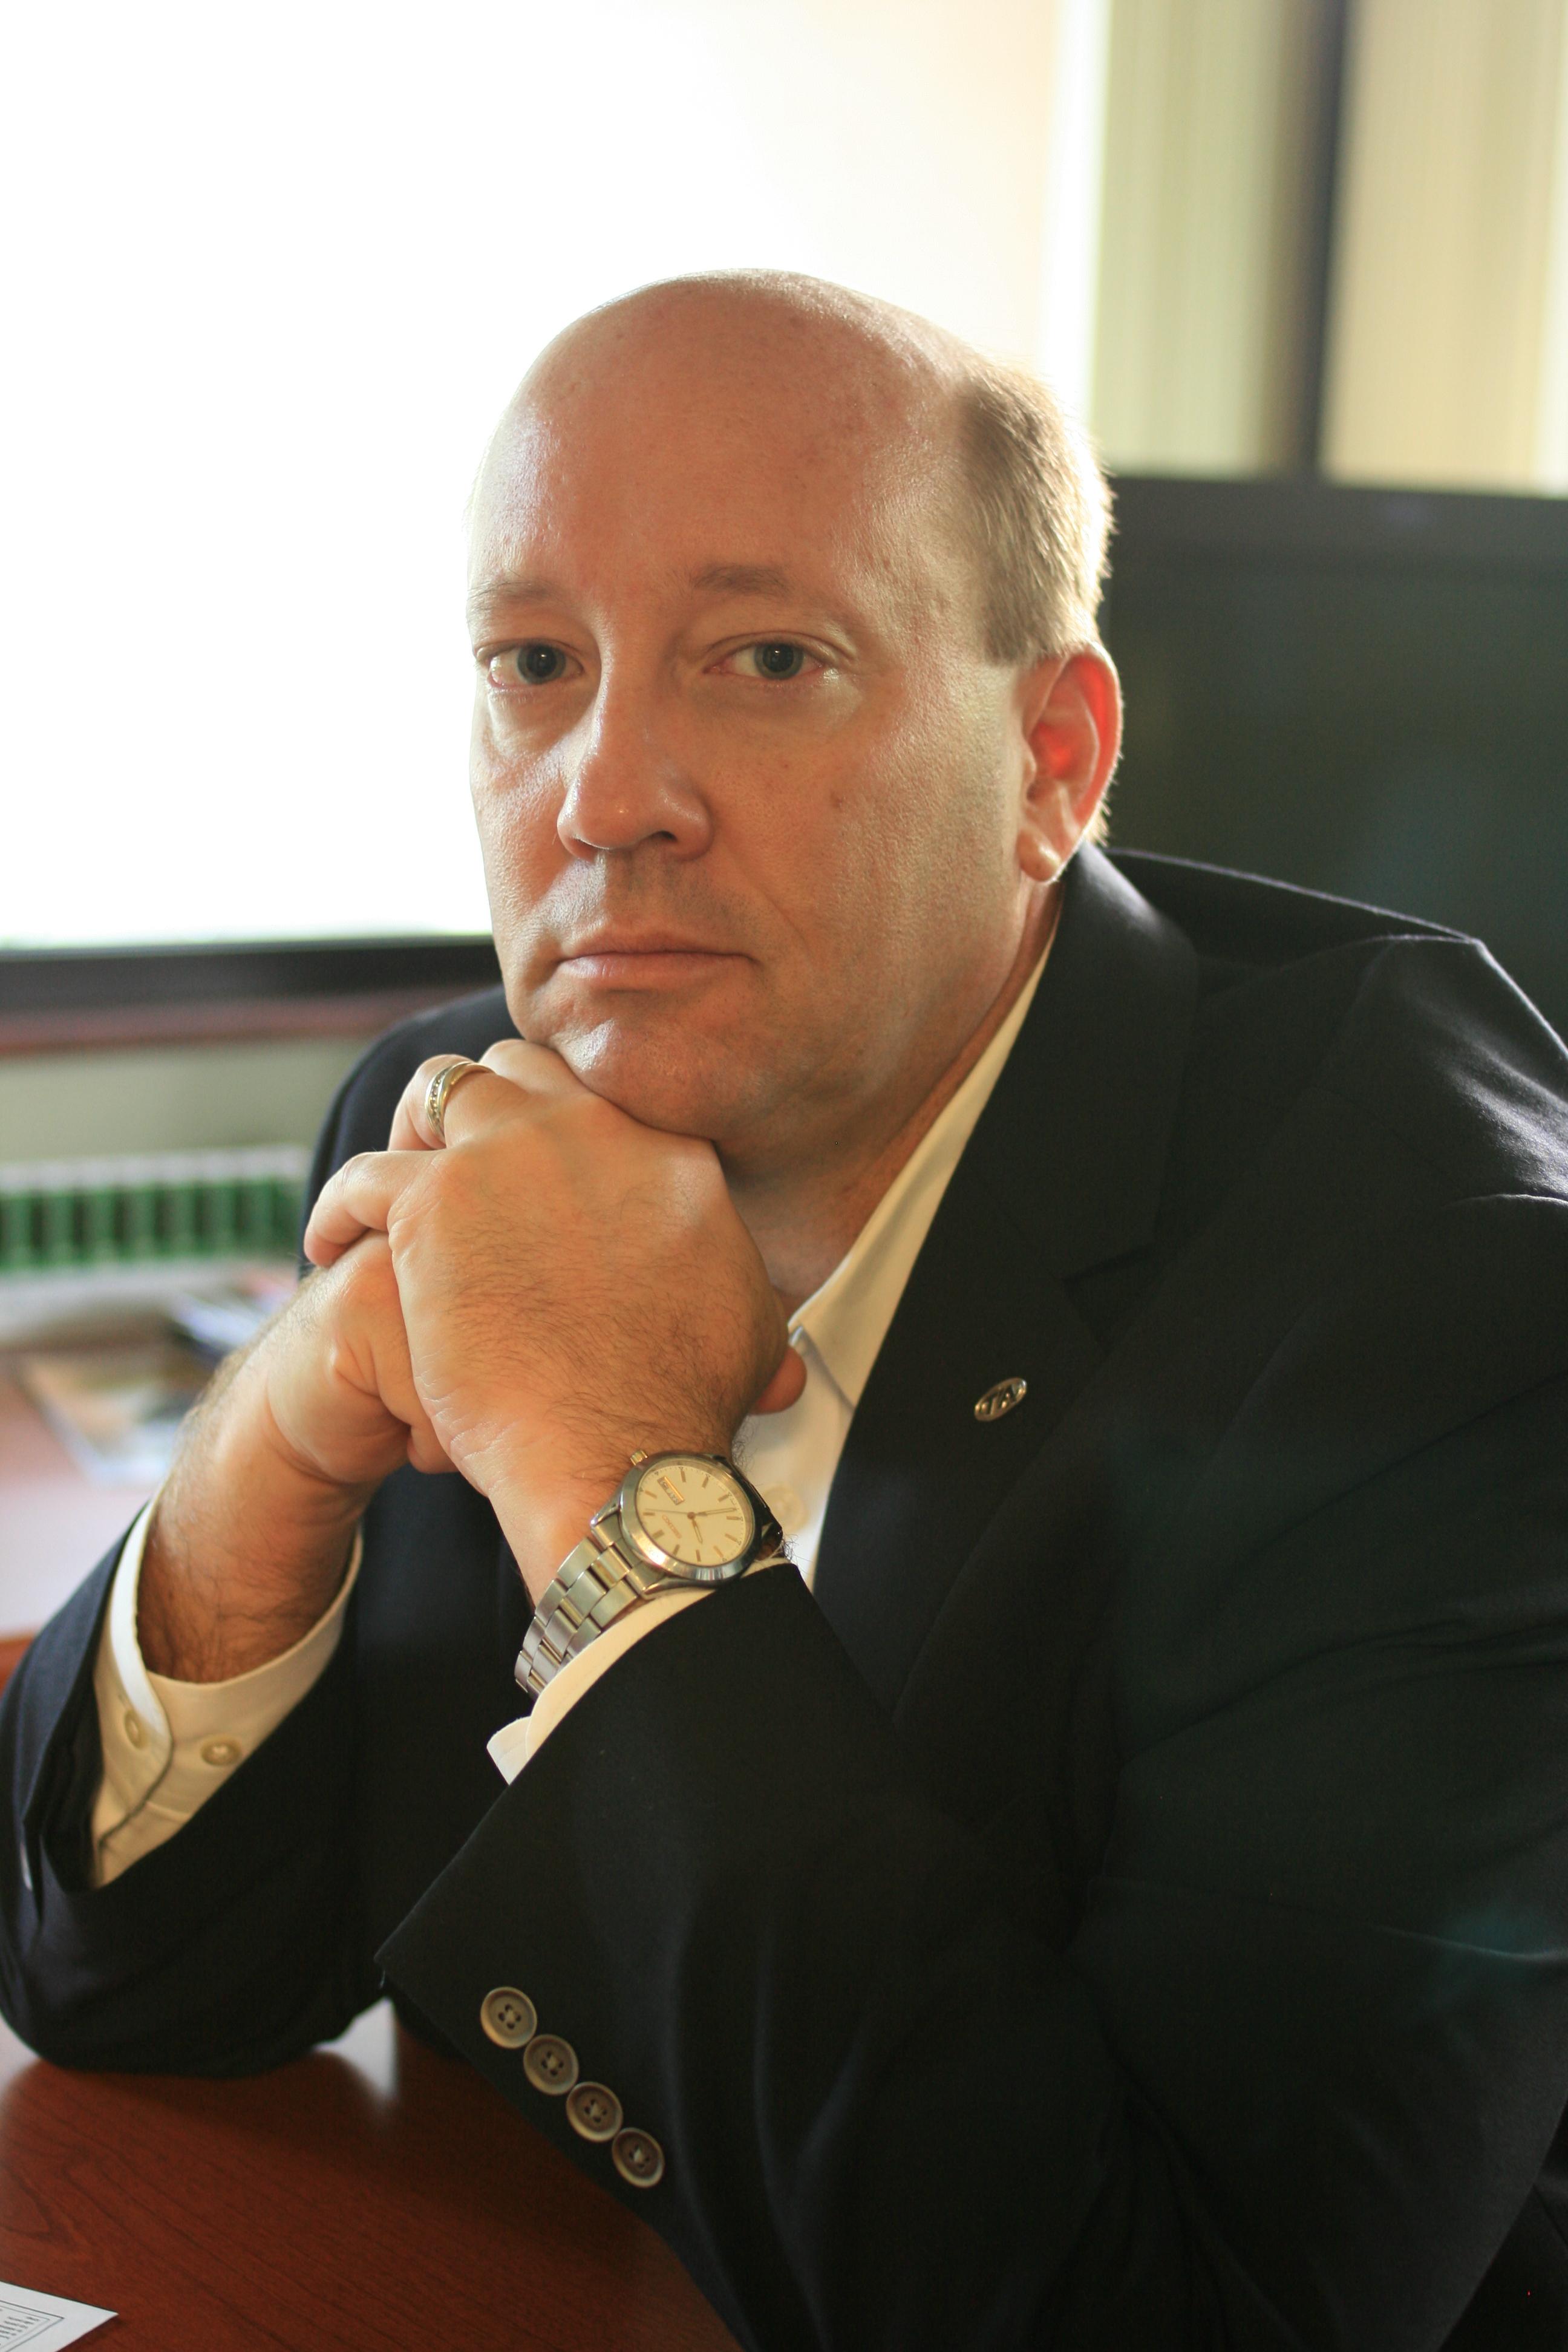 Fred Yentz, CEO of Telit IoT Platforms